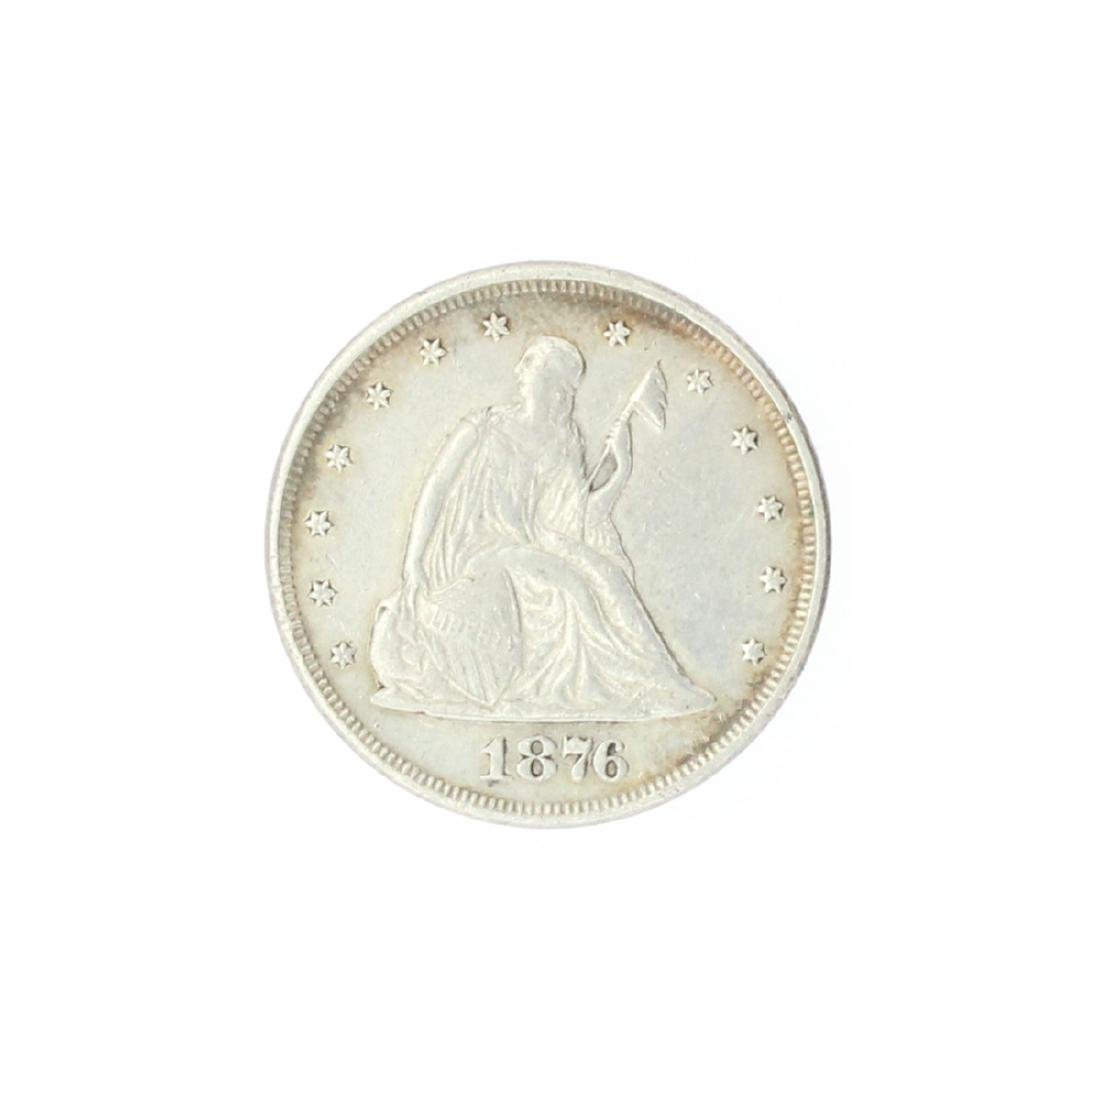 1876 Liberty Seated Twenty Cent Coin